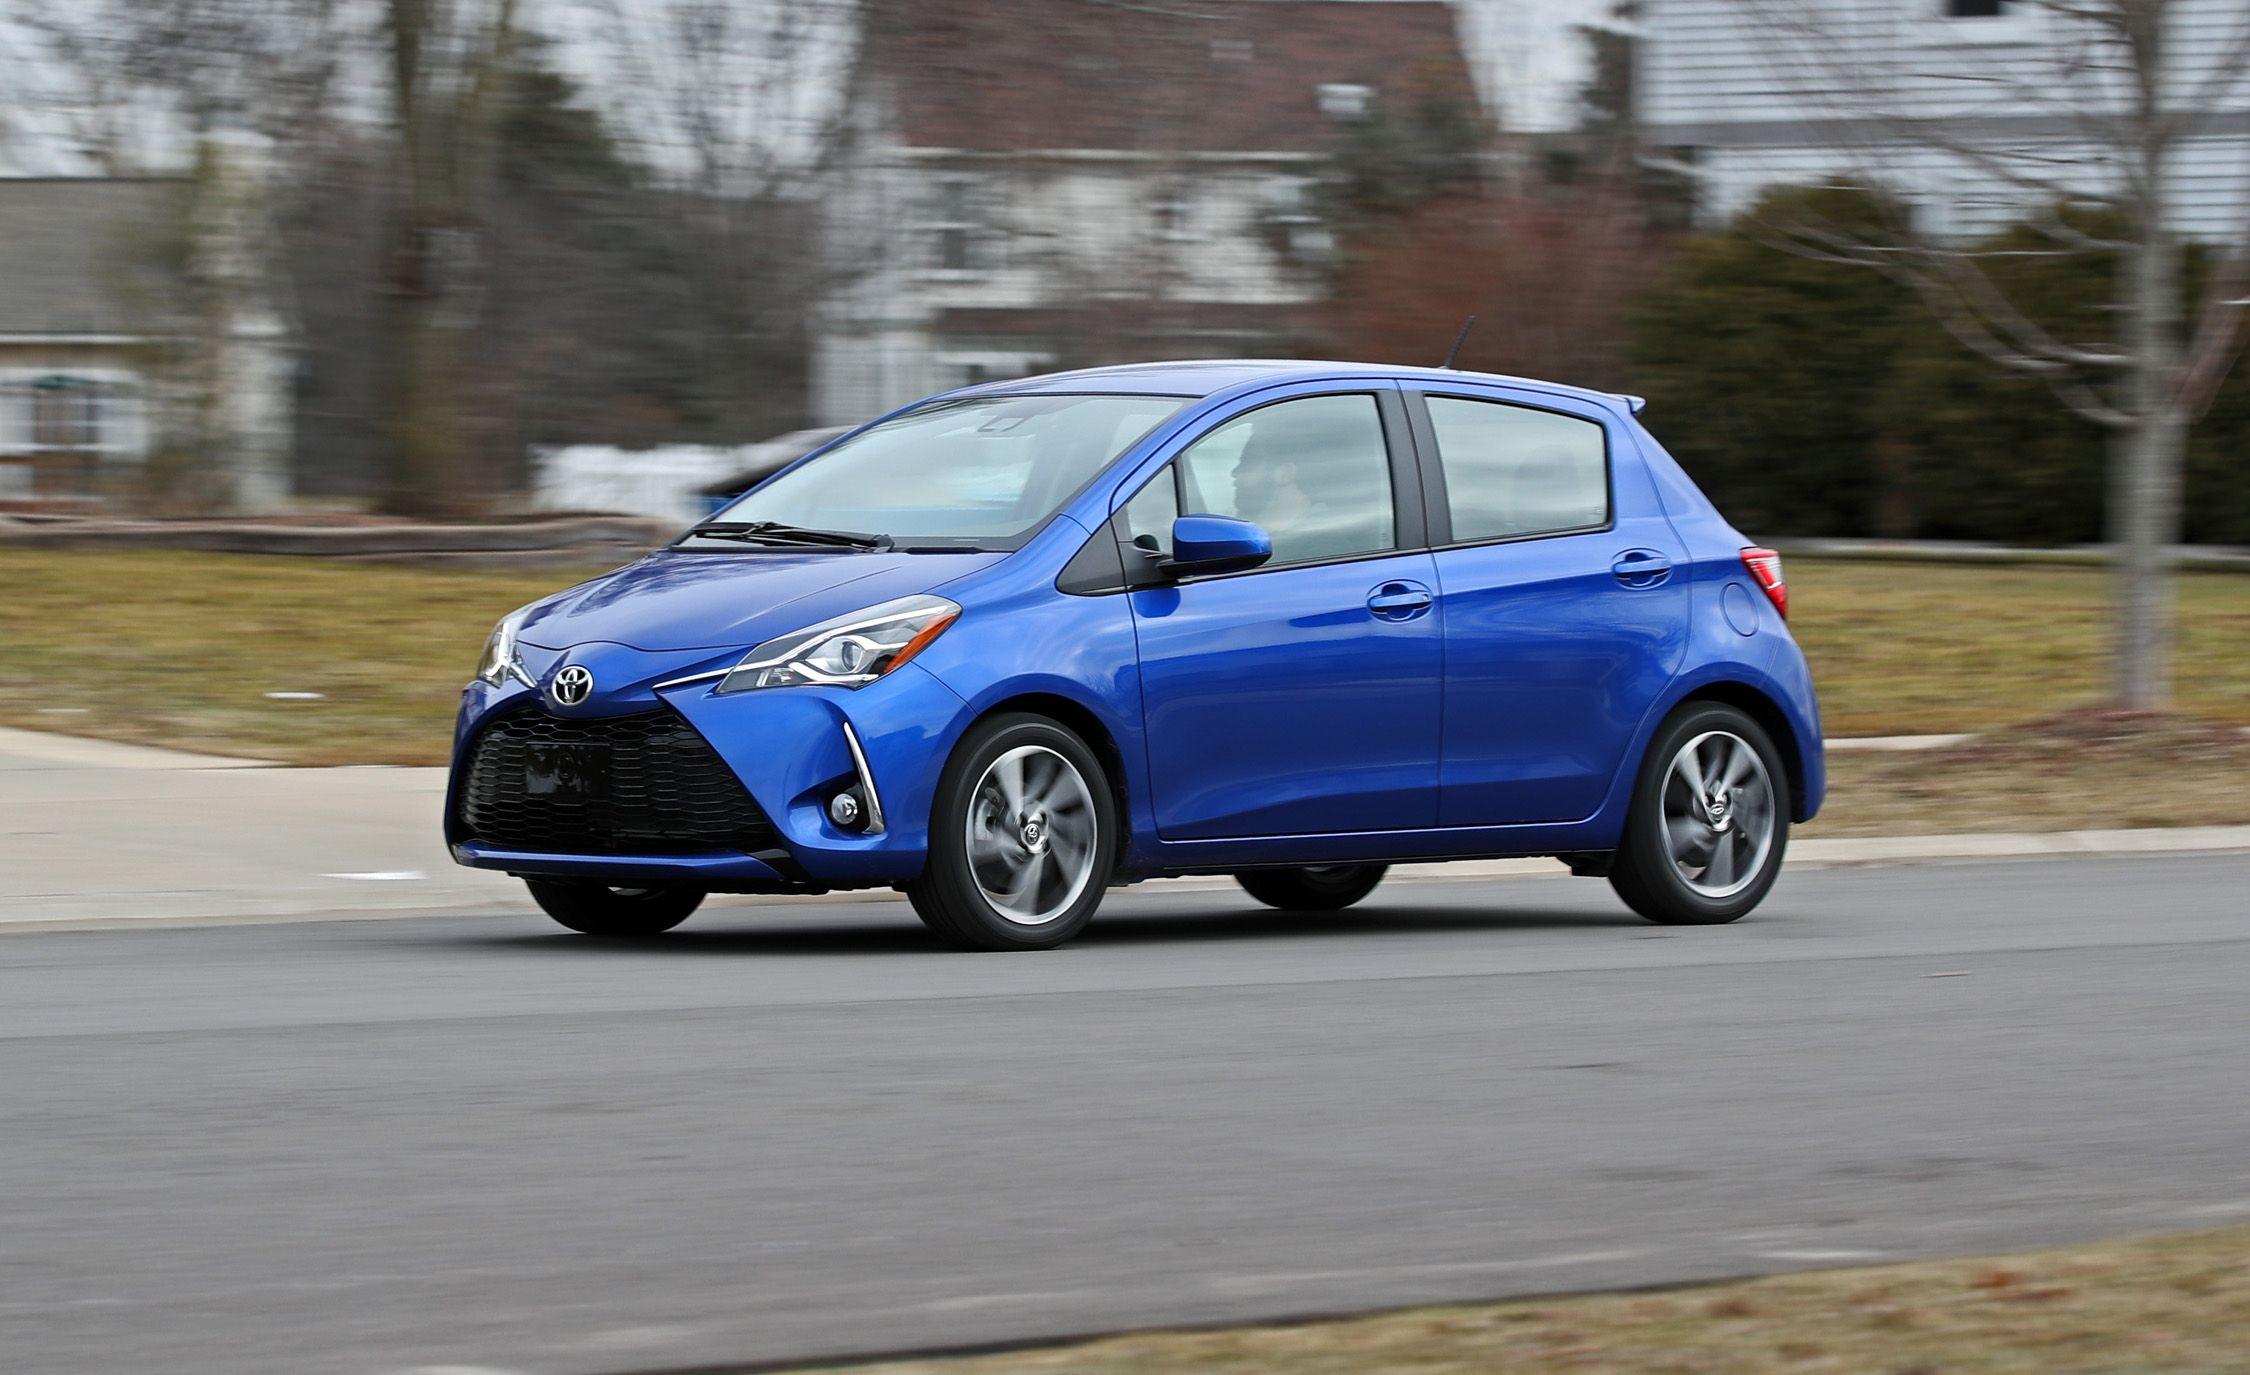 2019 Toyota Yaris Reviews Toyota Yaris Price Photos And Specs